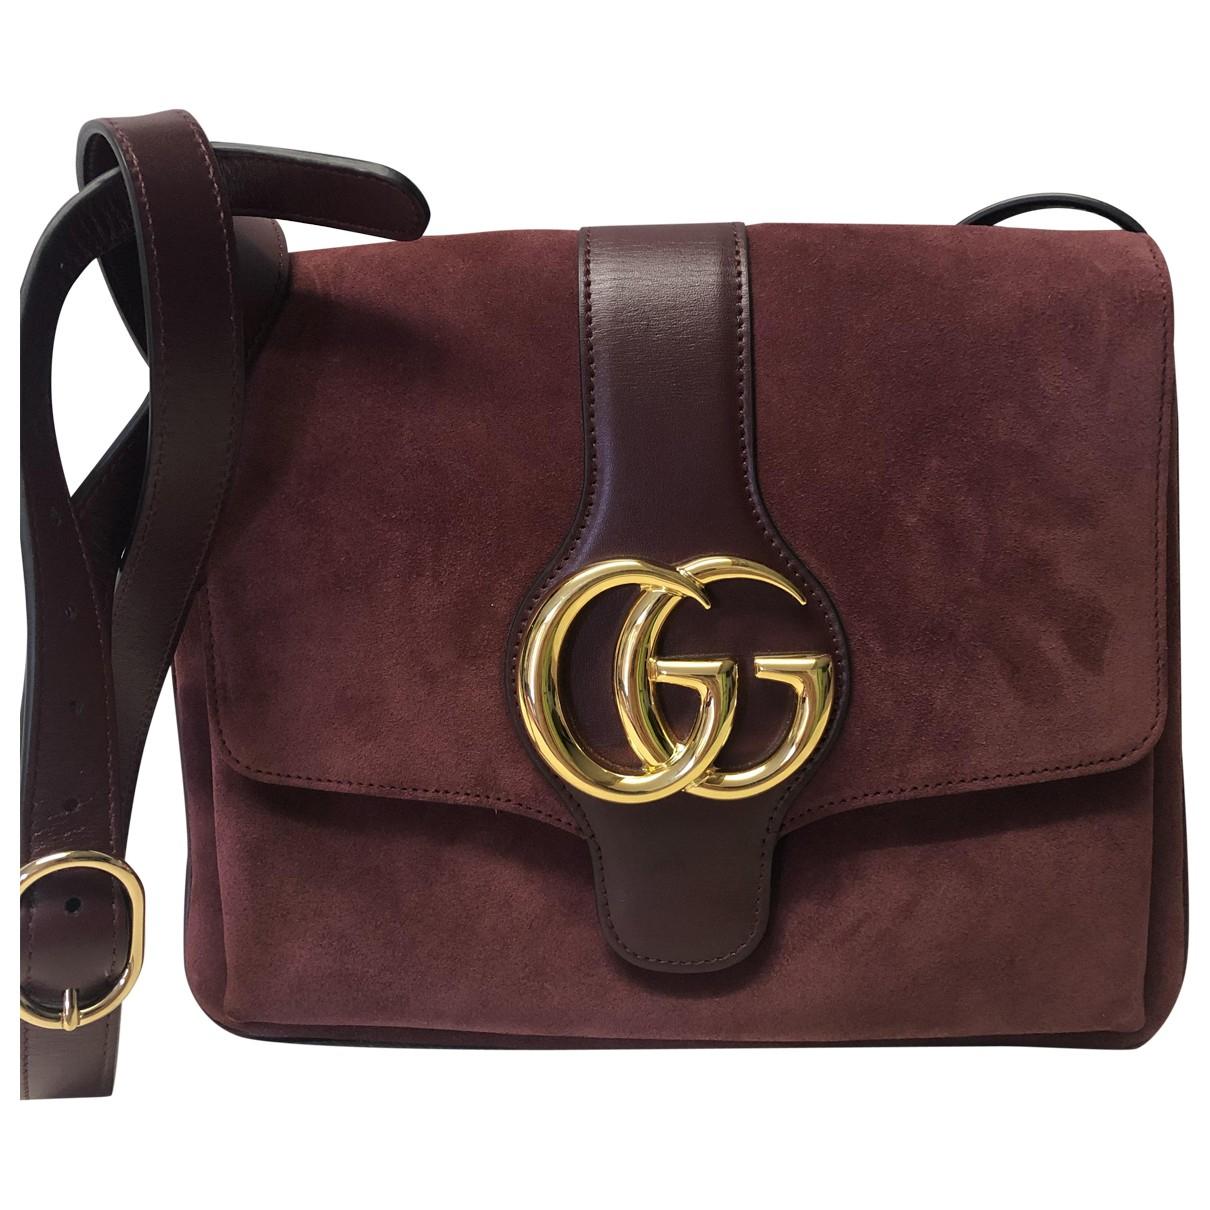 Gucci Arli Handtasche in  Bordeauxrot Veloursleder